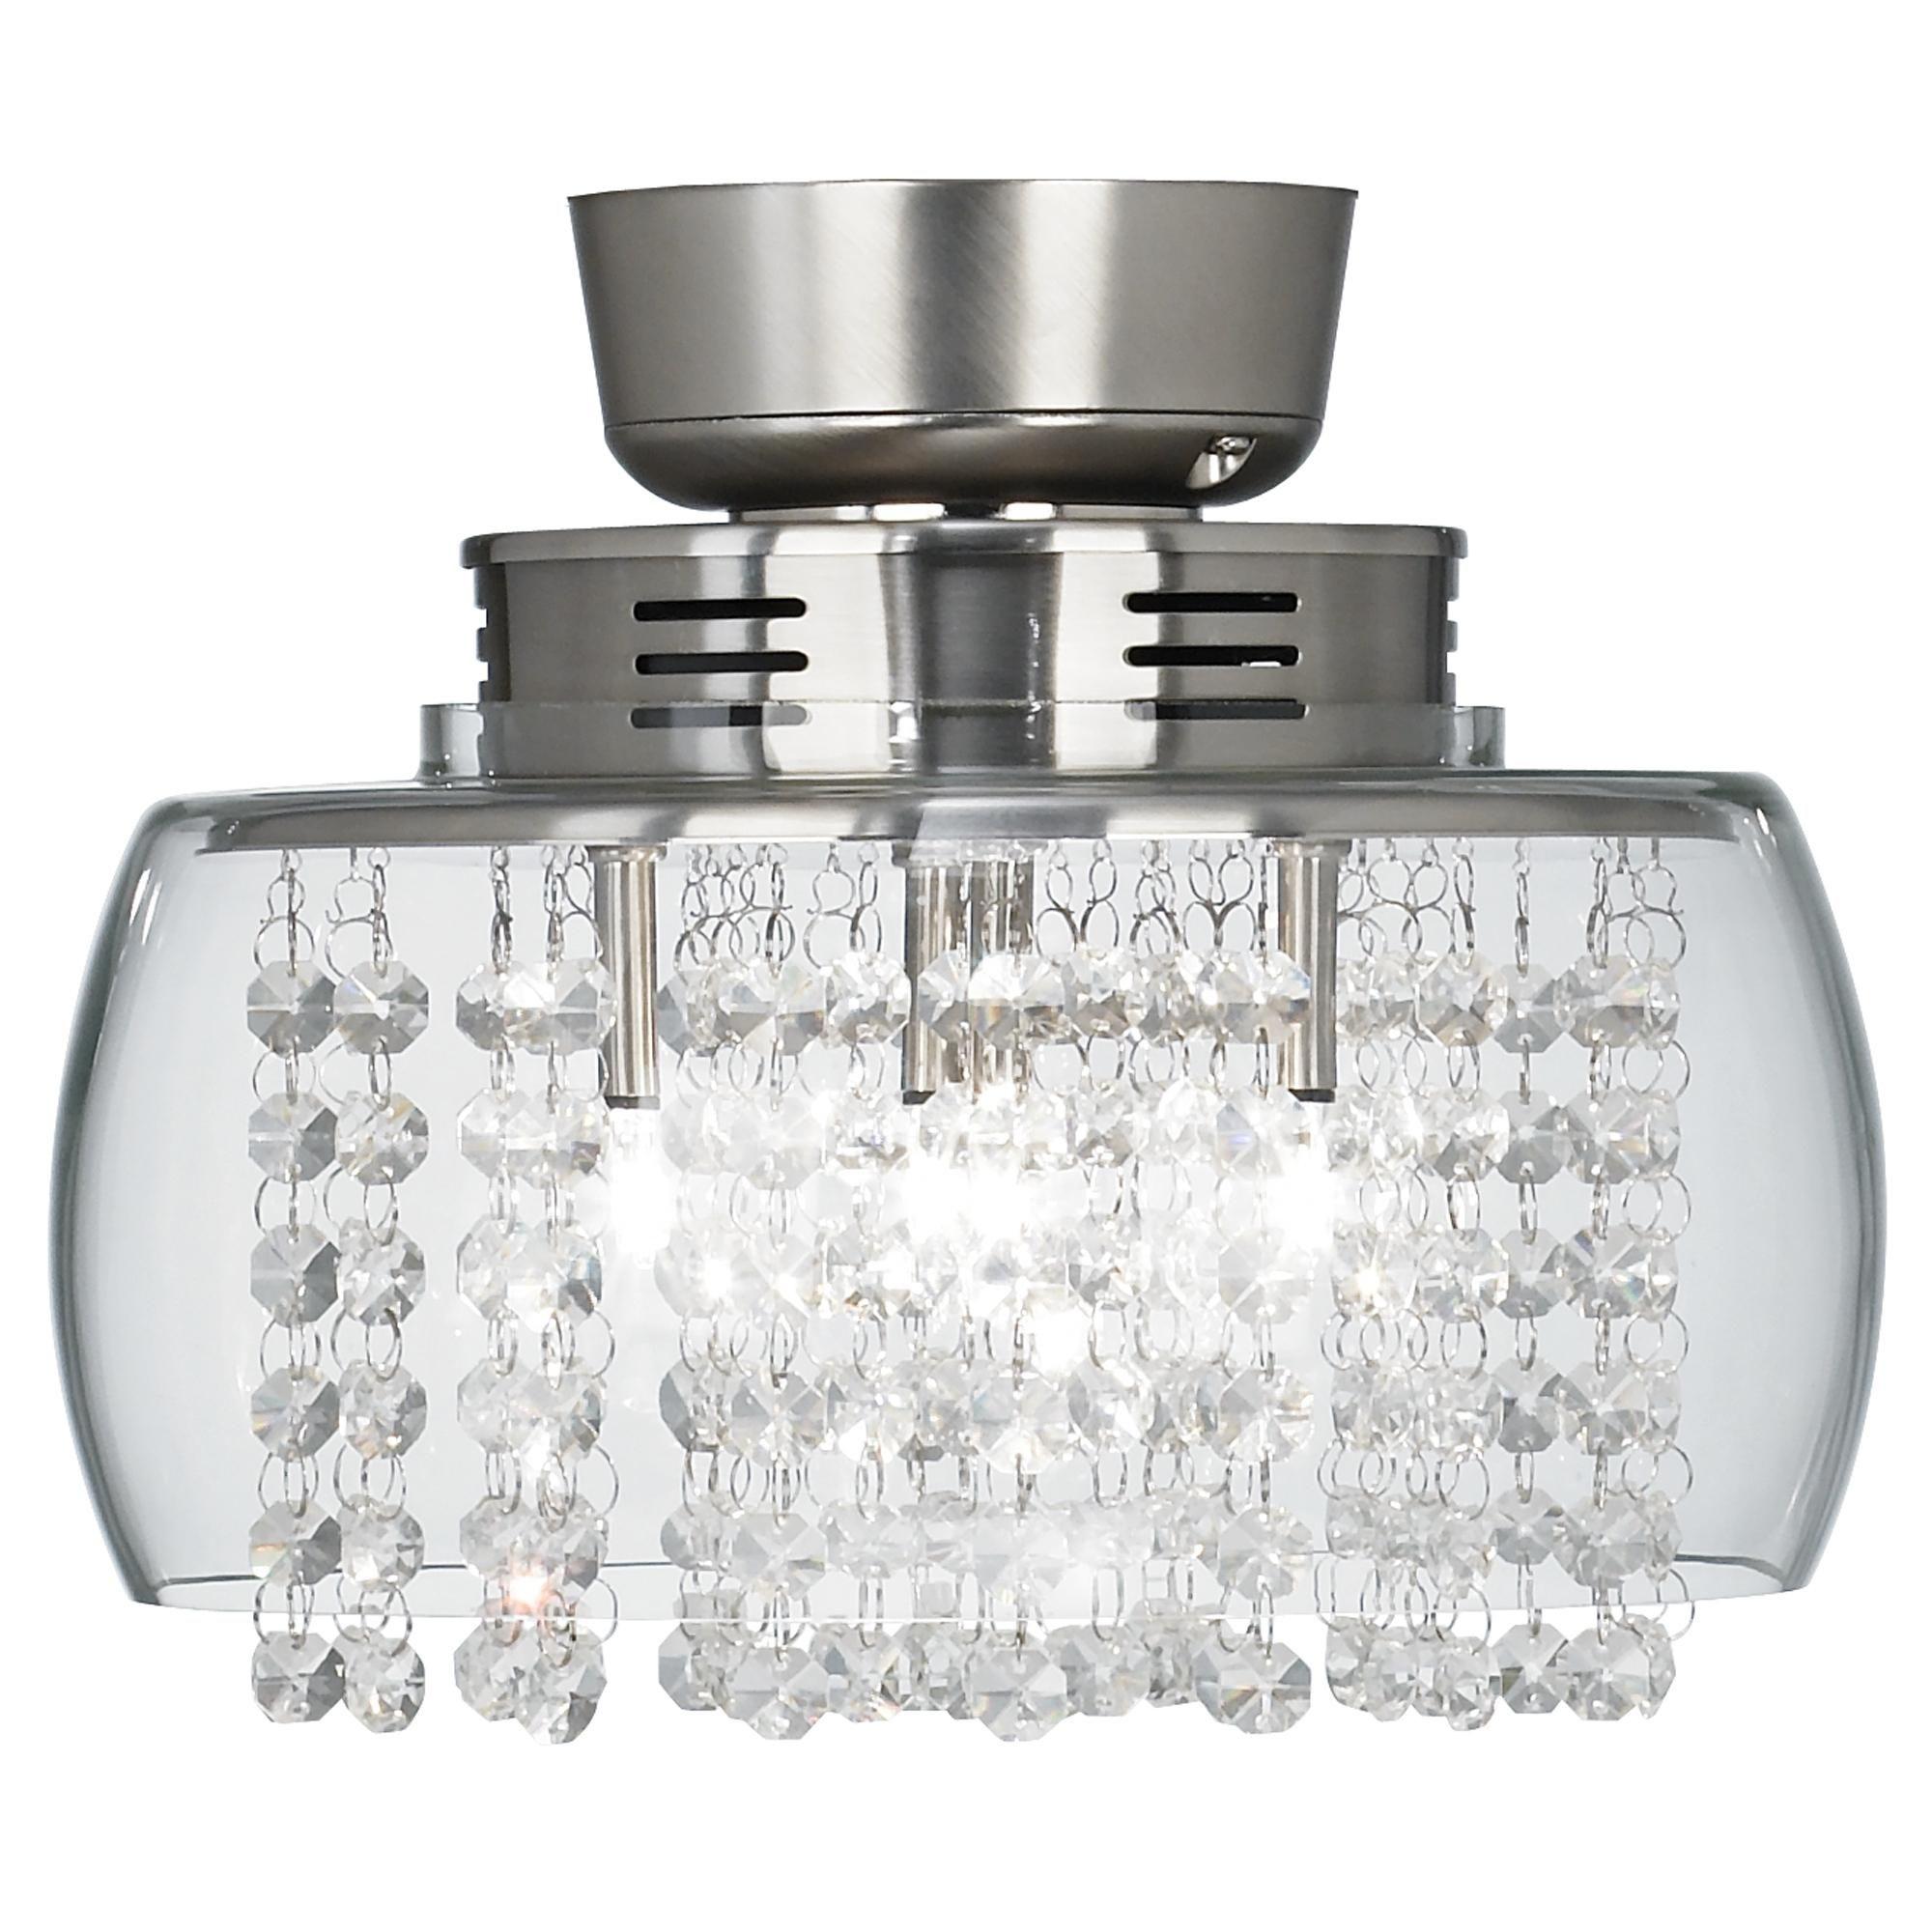 Image of: Crystal Ceiling Fan Light Kit Ideas On Foter